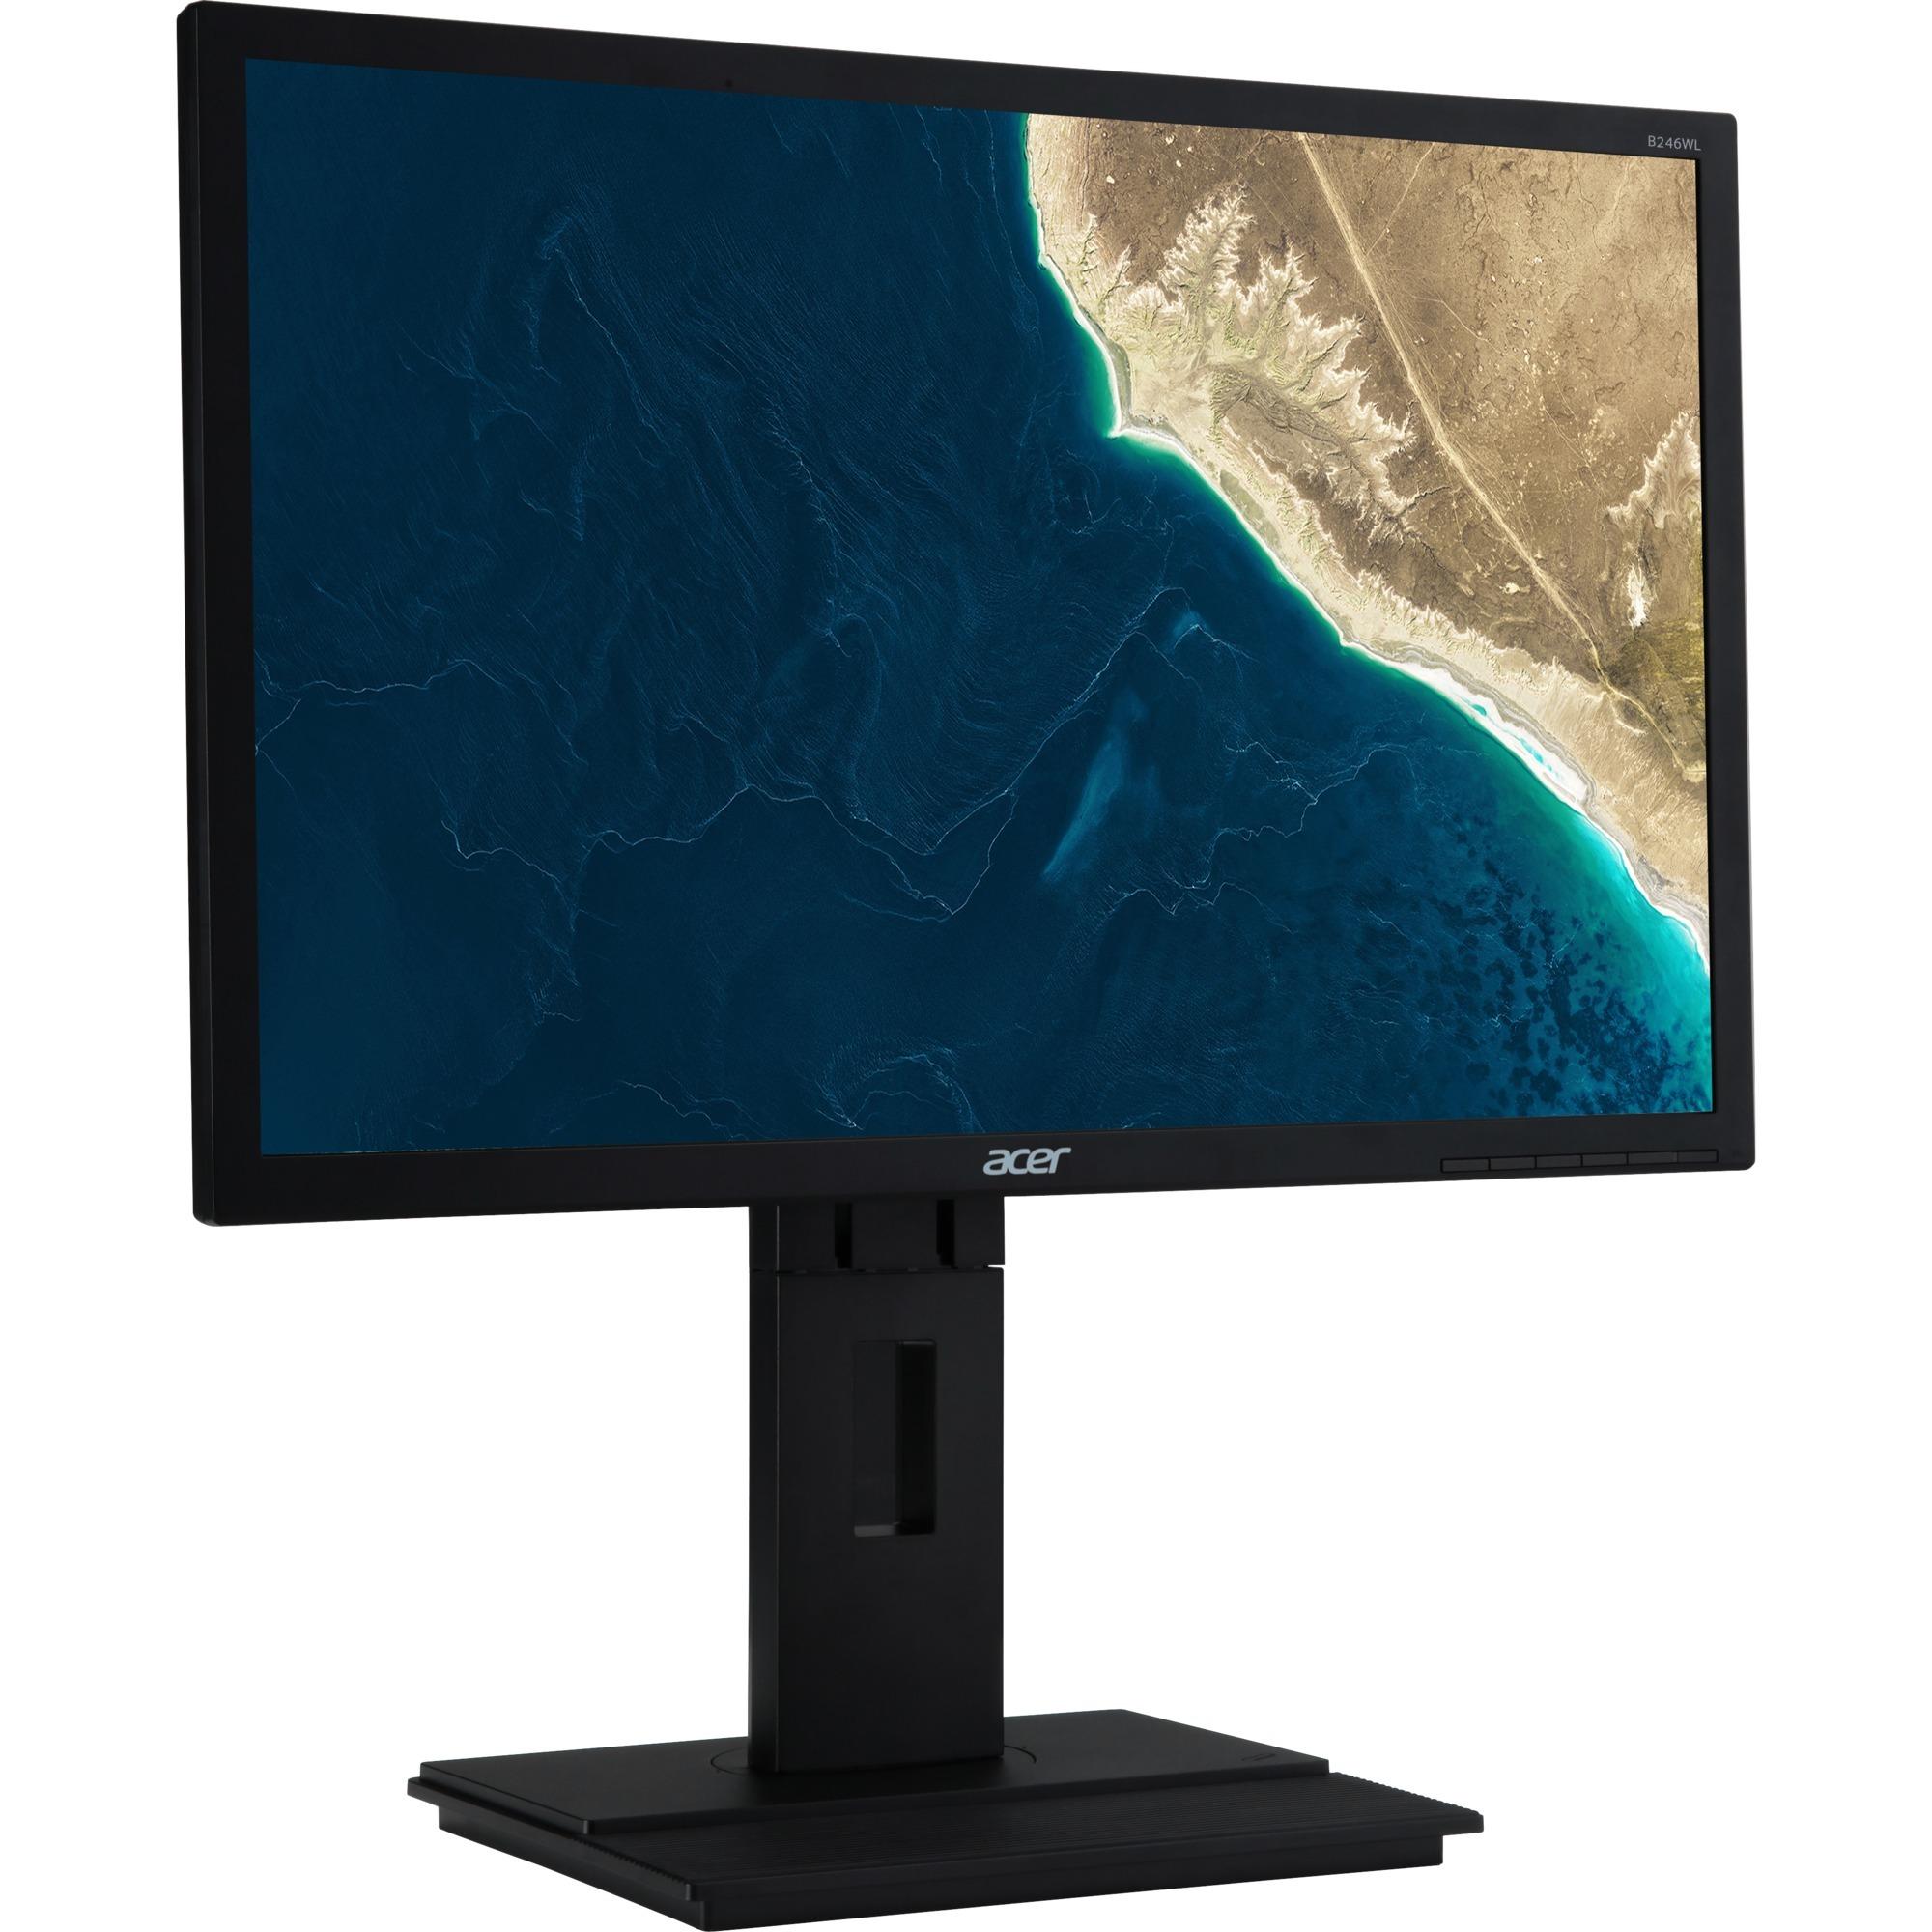 "B6 B246WLA pantalla para PC 61 cm (24"") WUXGA LED Plana Negro, Monitor LED"